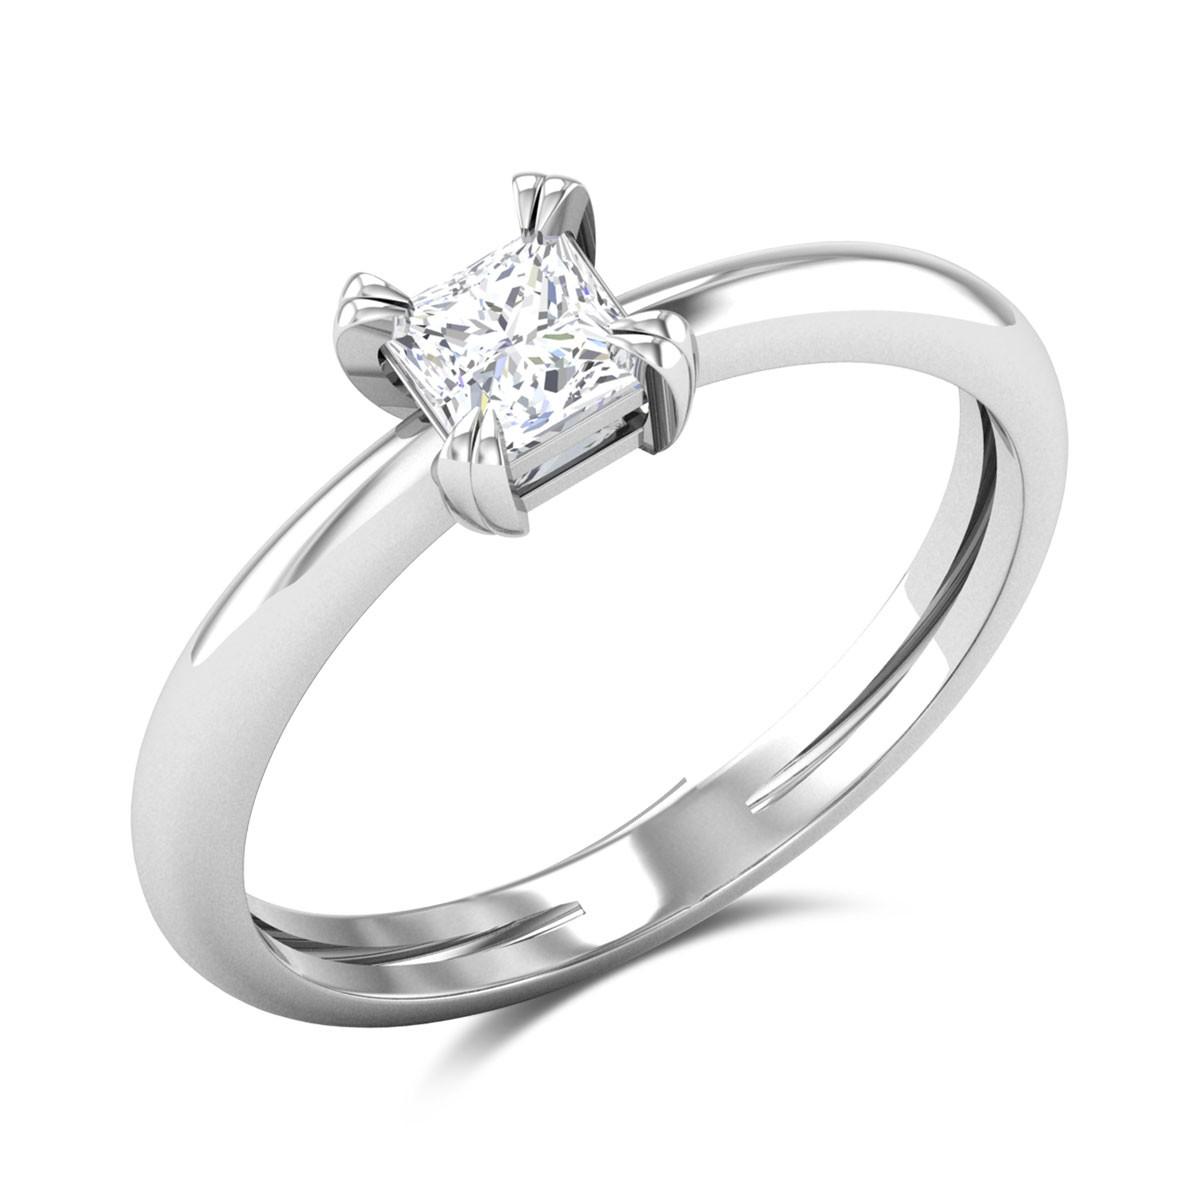 Ozias Princess Cut Solitaire Ring